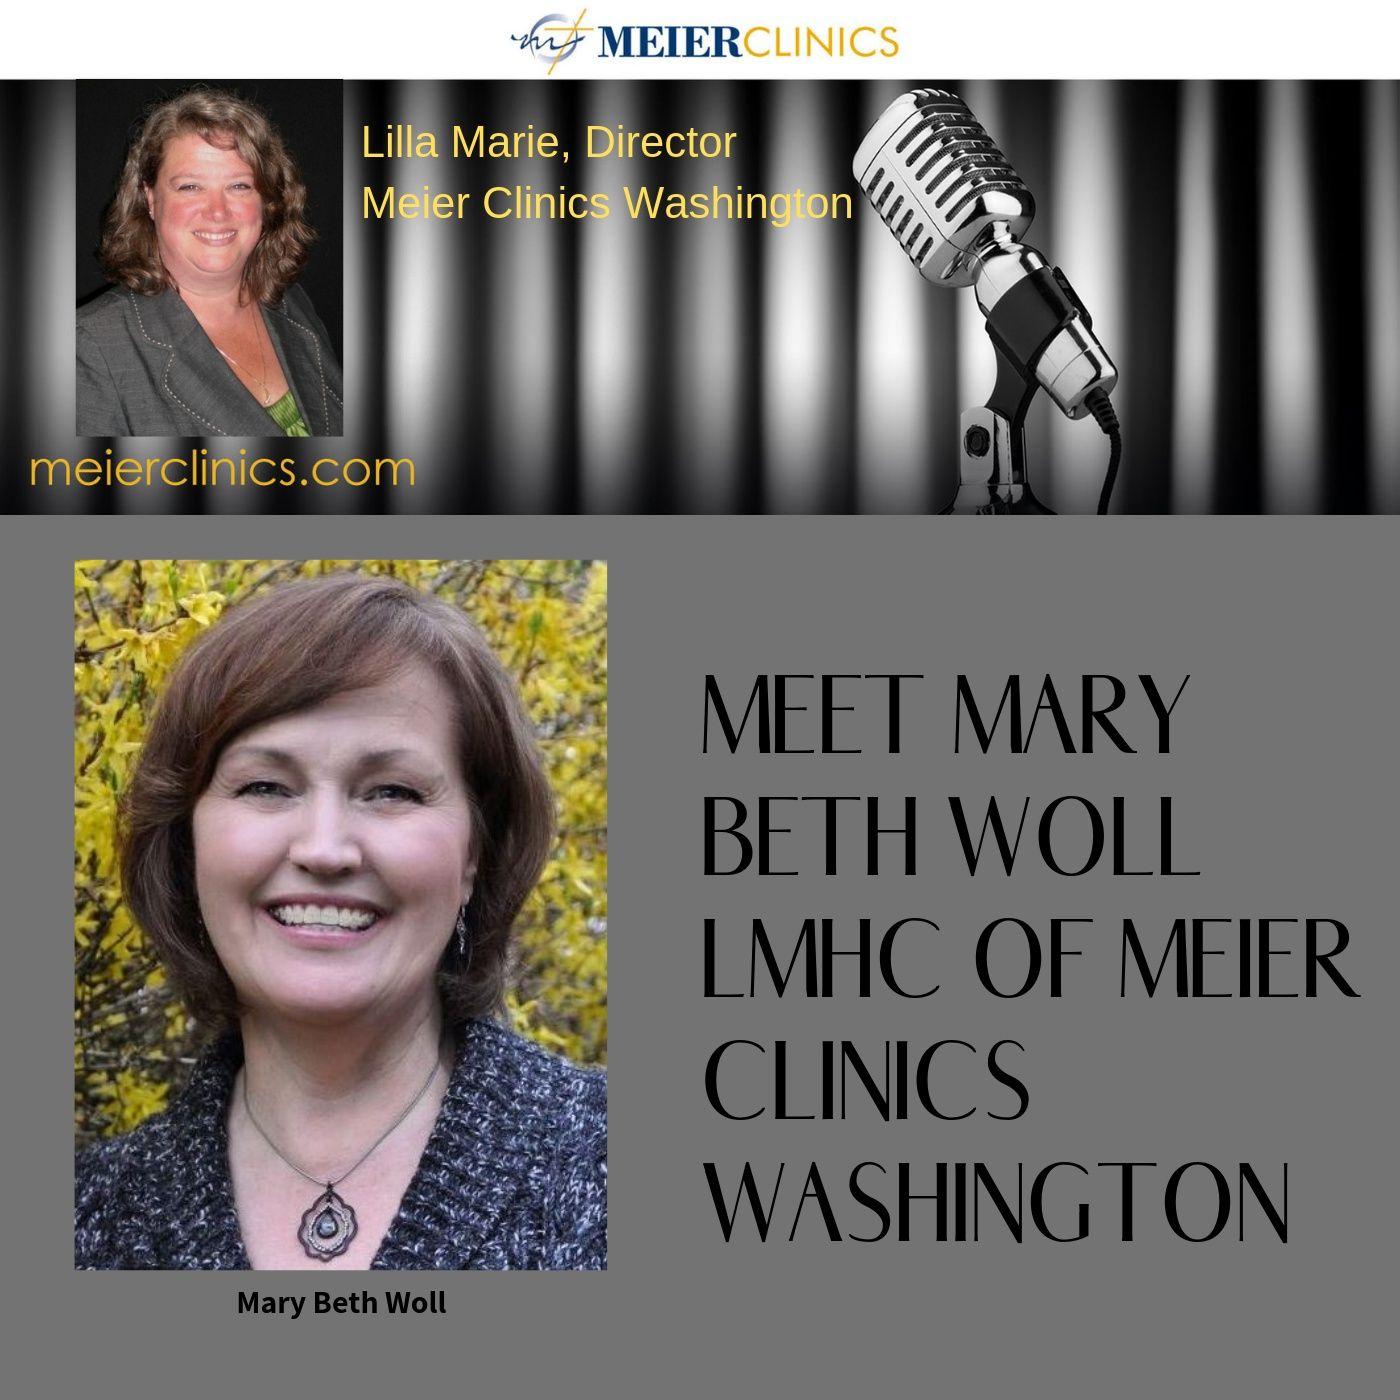 Meet Mary Beth Woll LMHC Of Meier Clinics Washington